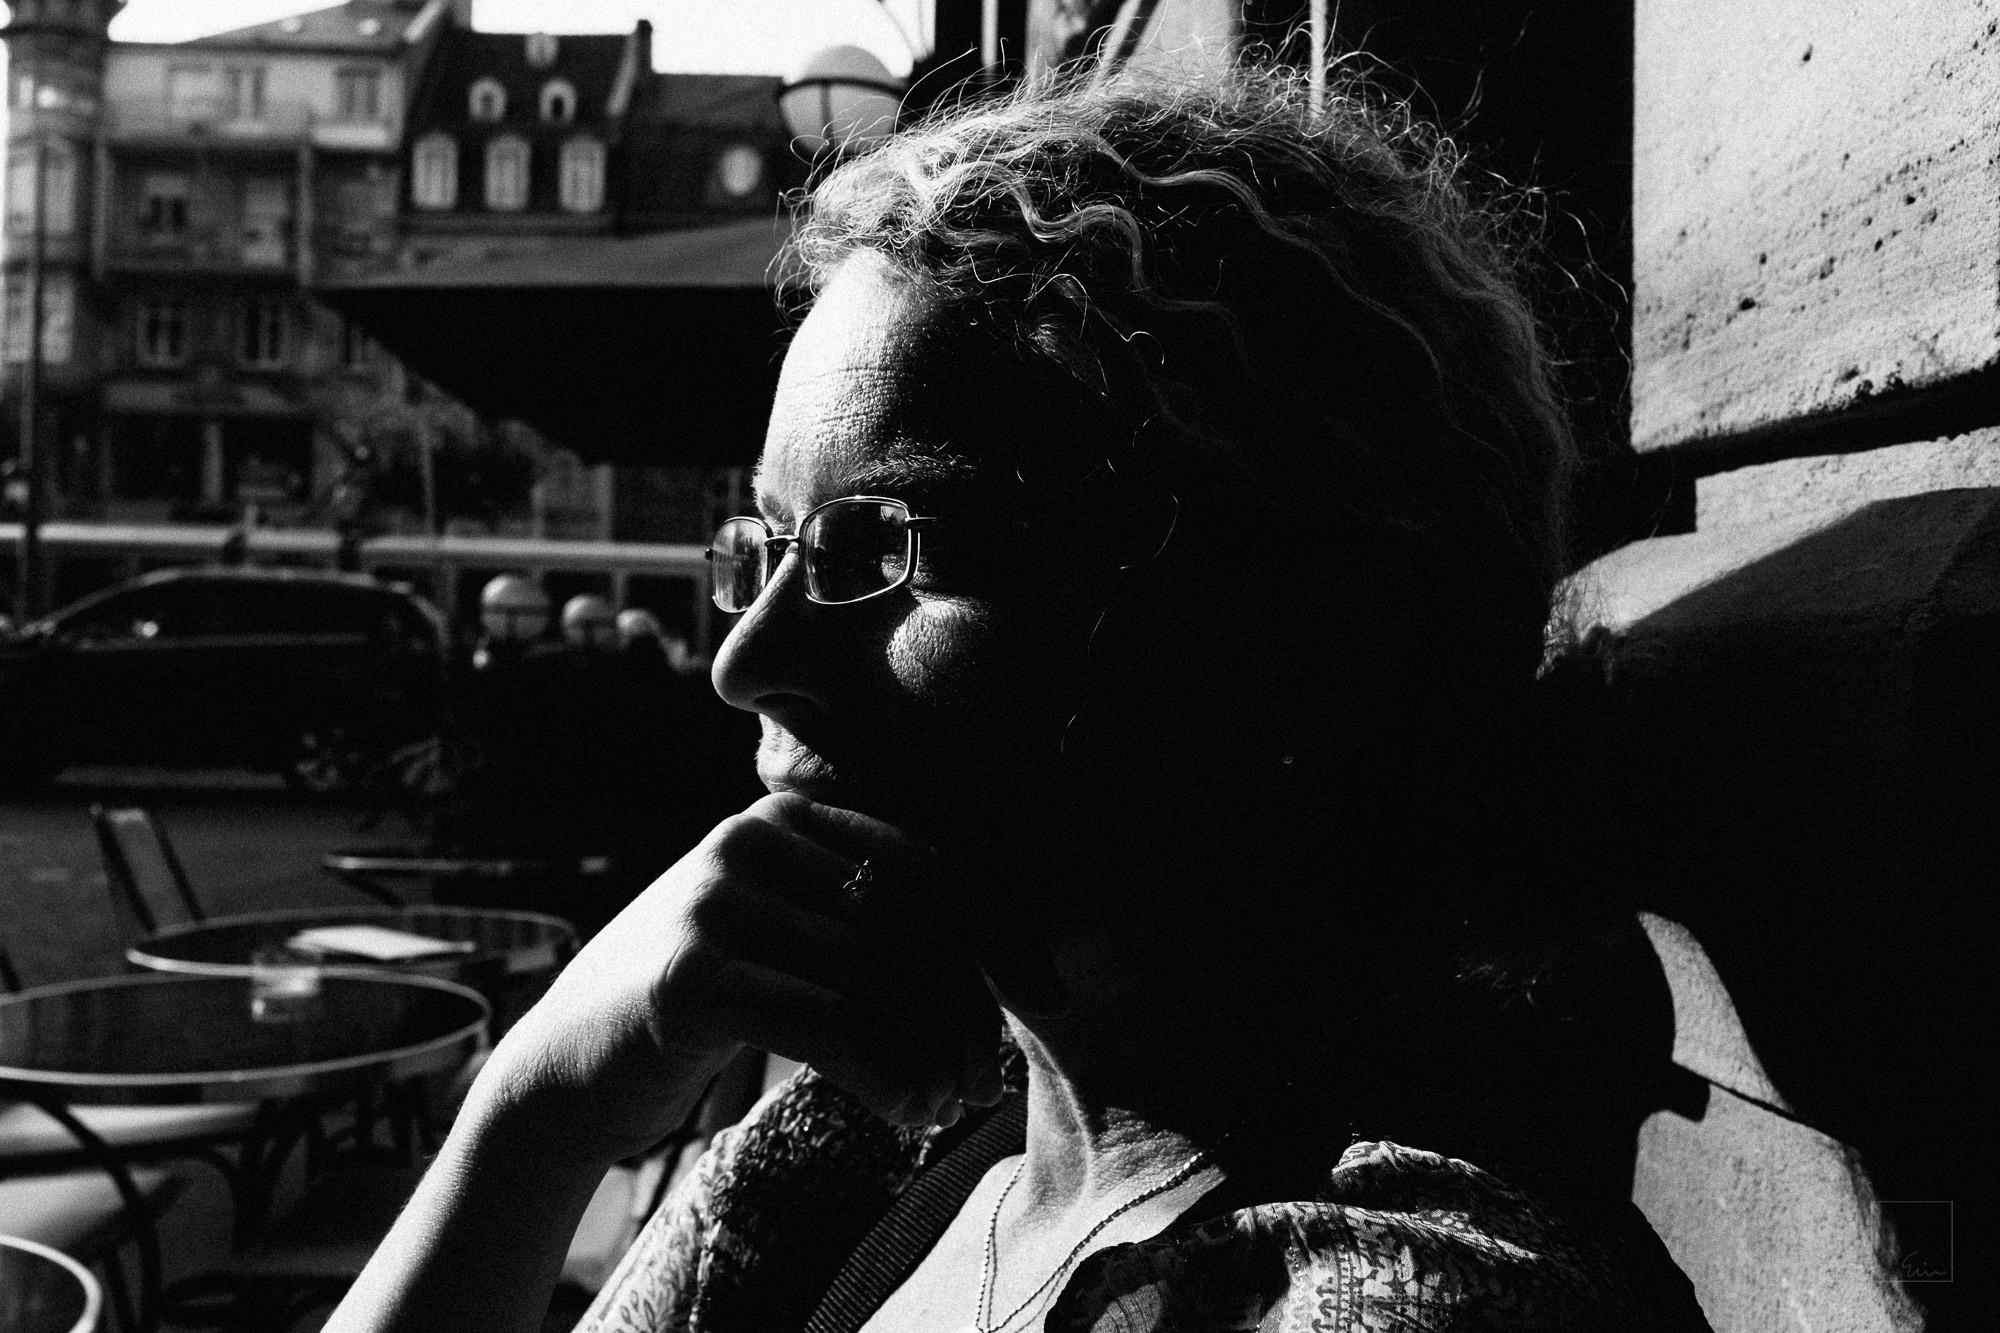 Contemplating café life as a pastime